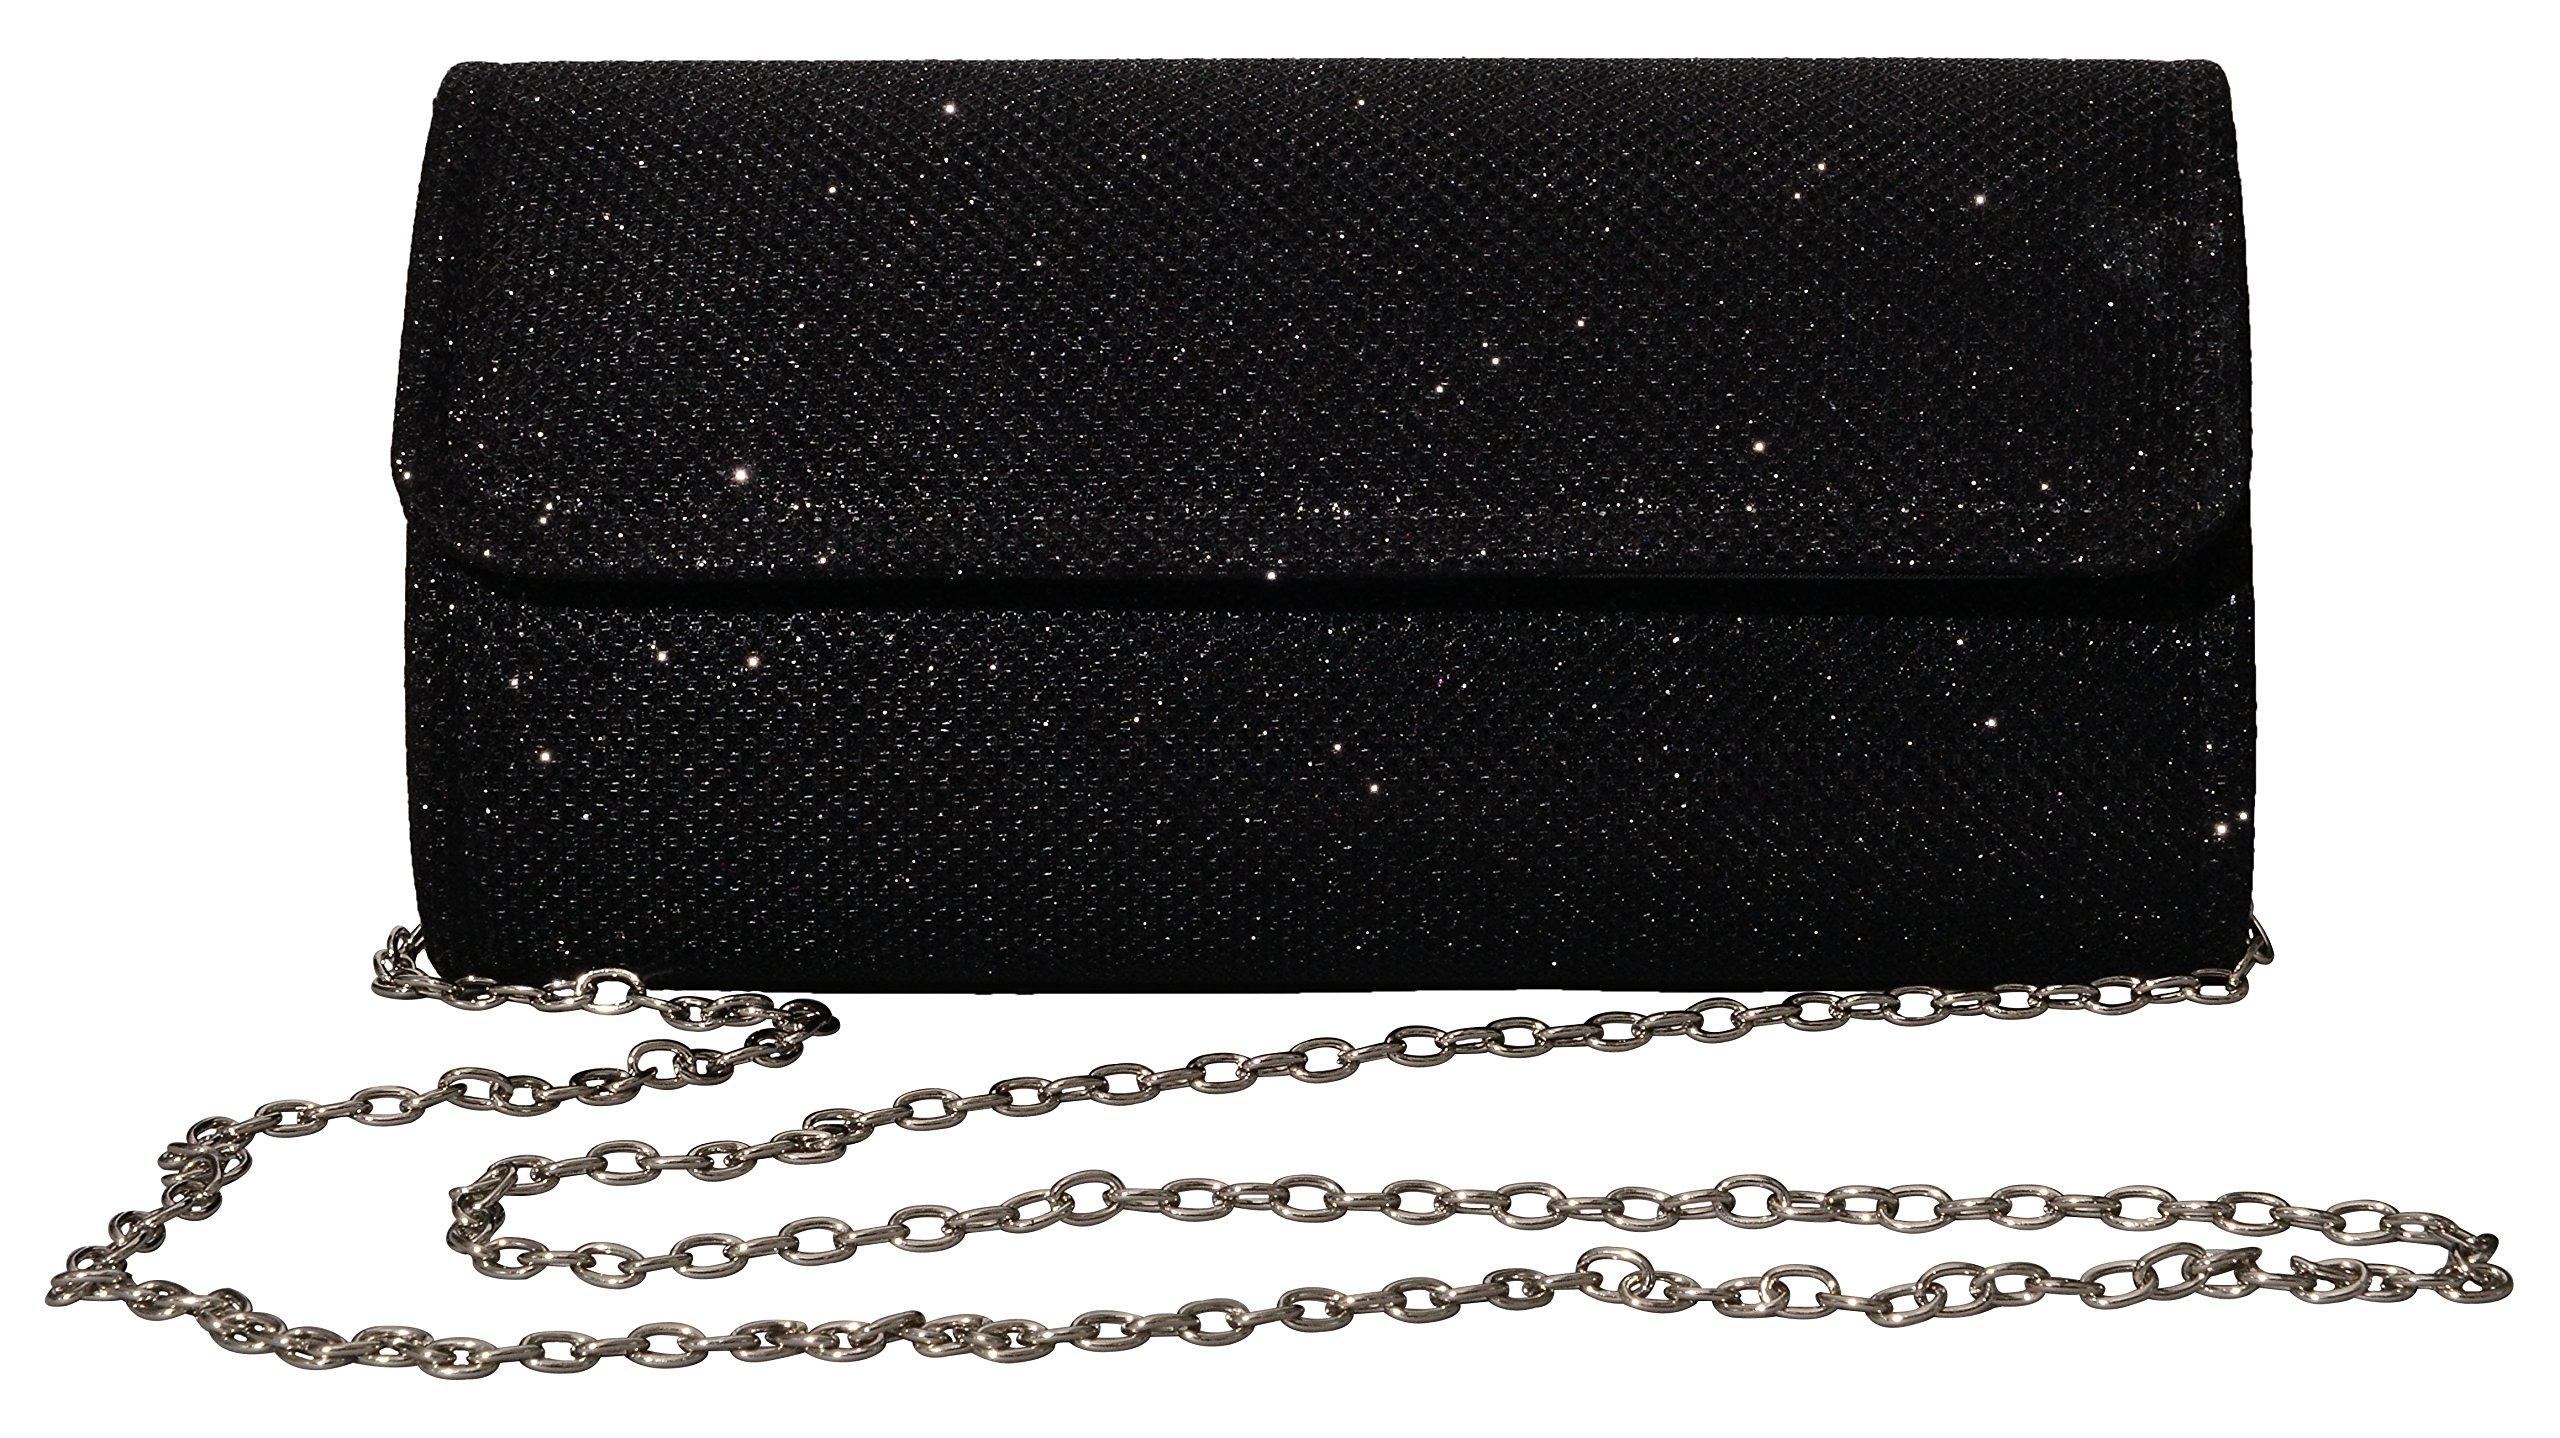 Outrip Women's Evening Bag Clutch Purse Glitter Party Wedding Handbag with Chain (Black)